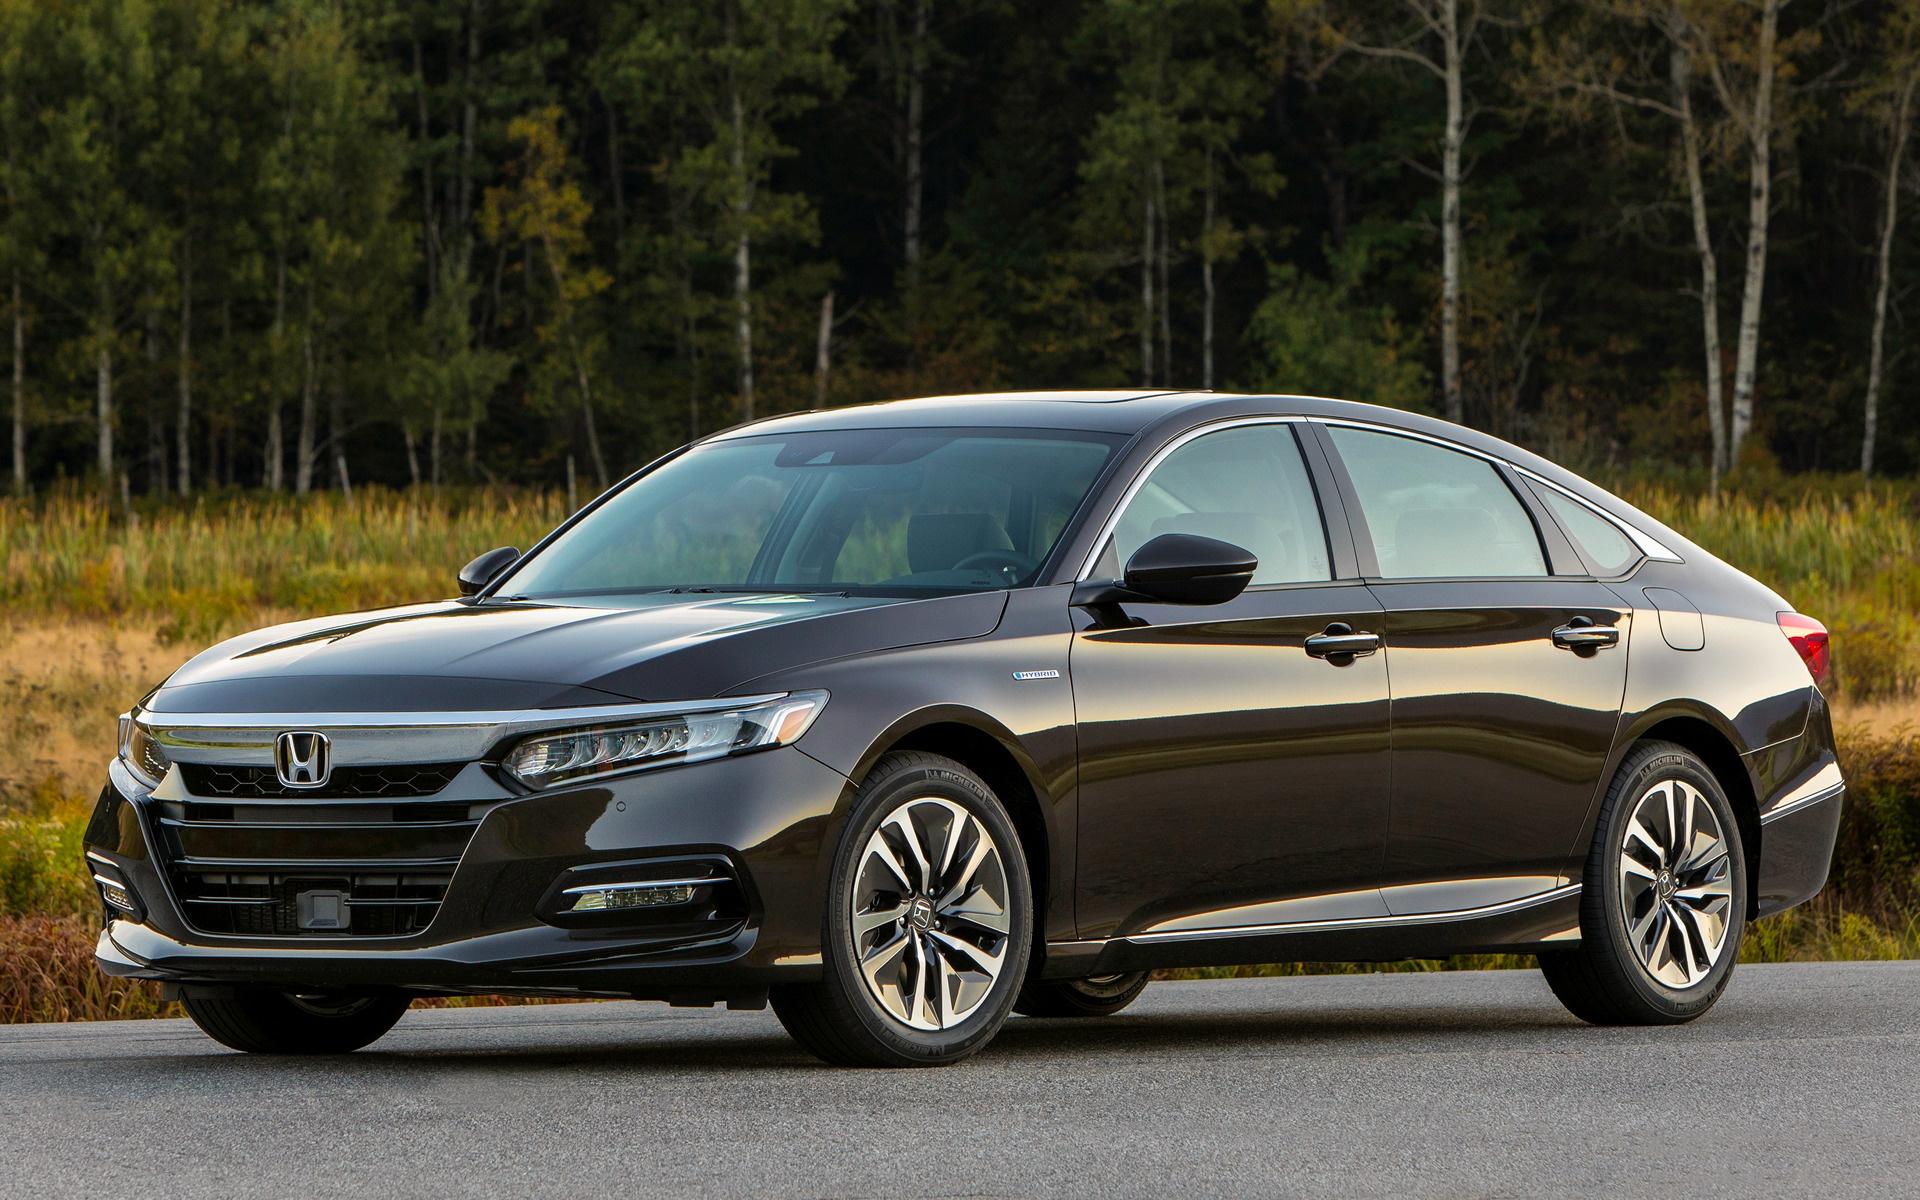 2018 Honda Accord Hybrid Touring - Wallpapers and HD ...